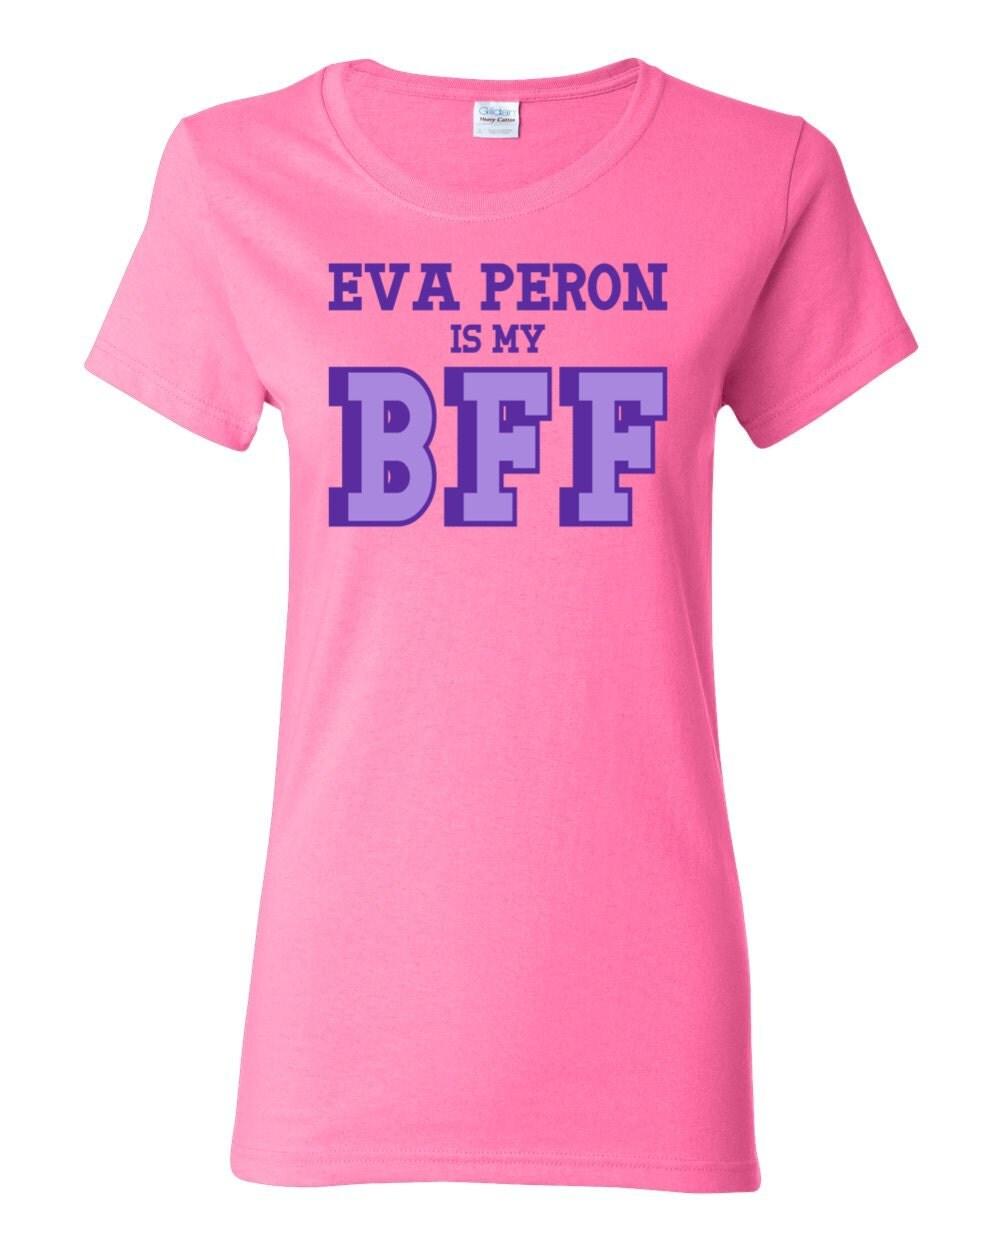 Great Women of History - Eva Peron is my BFF Womens History T-shirt